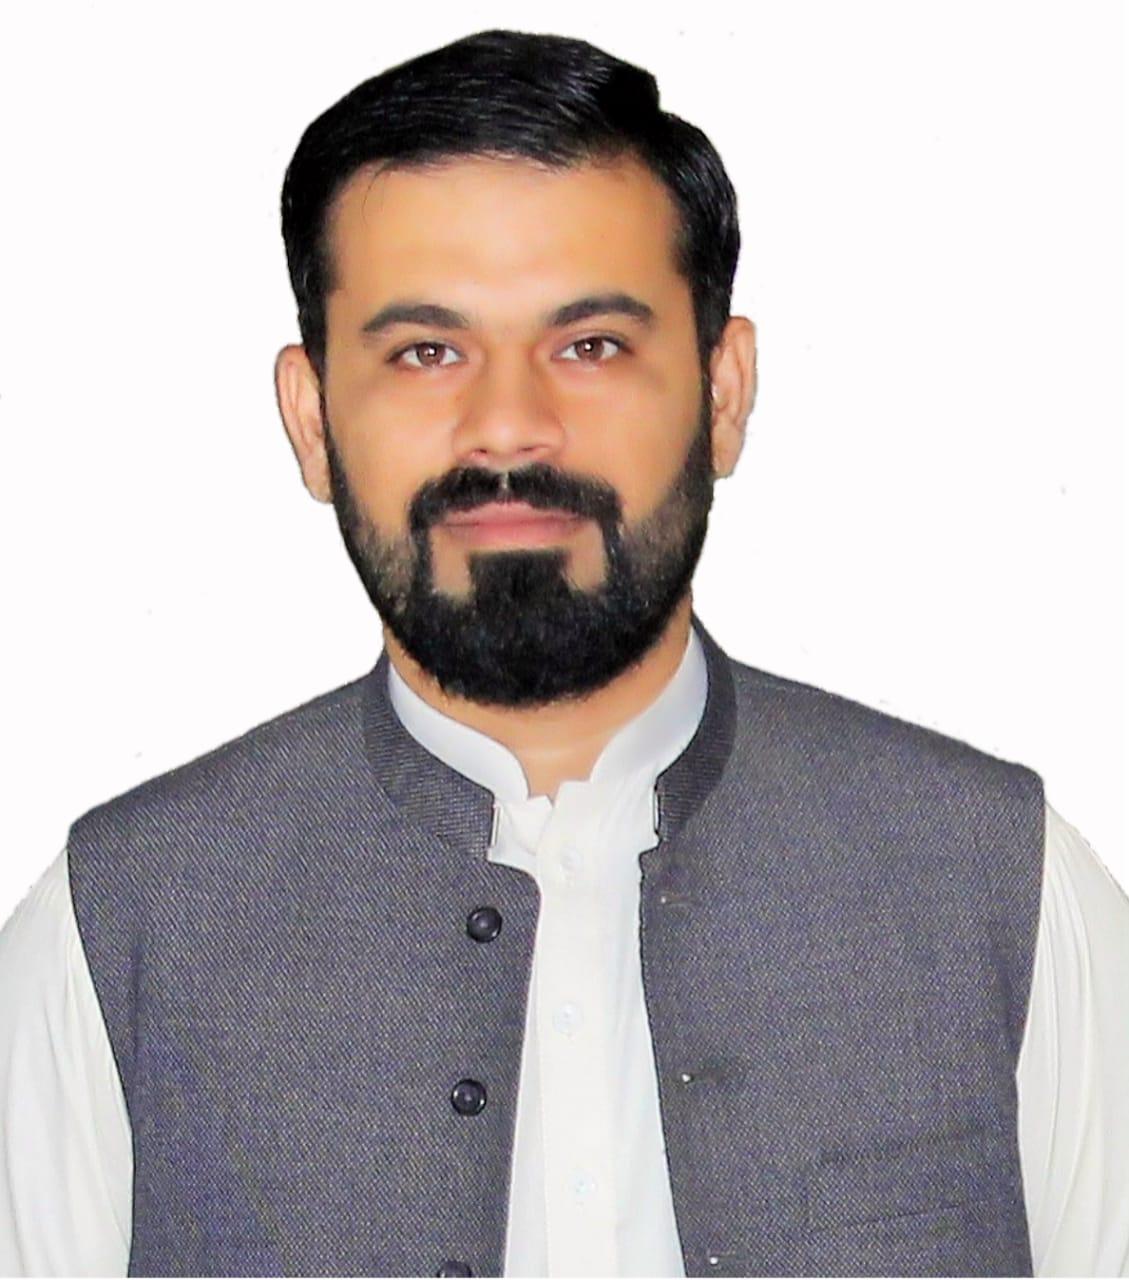 Mr. Syed Aizaz Ul Haq